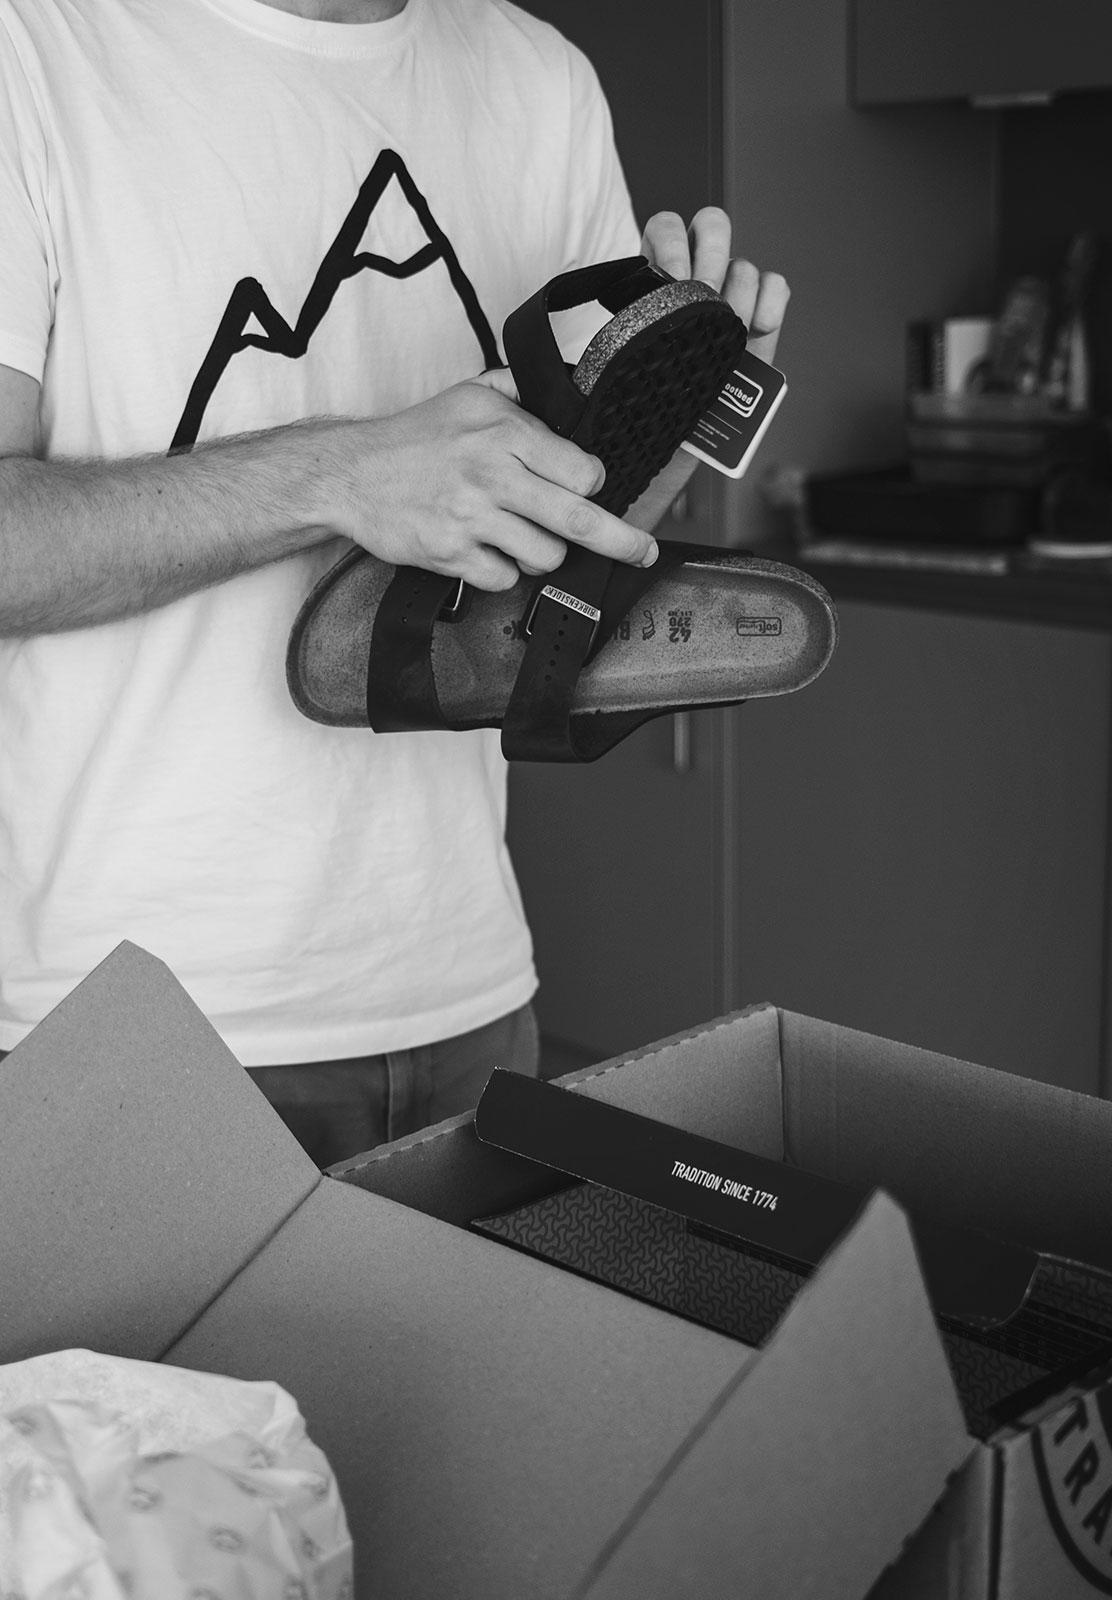 Man holding sandals